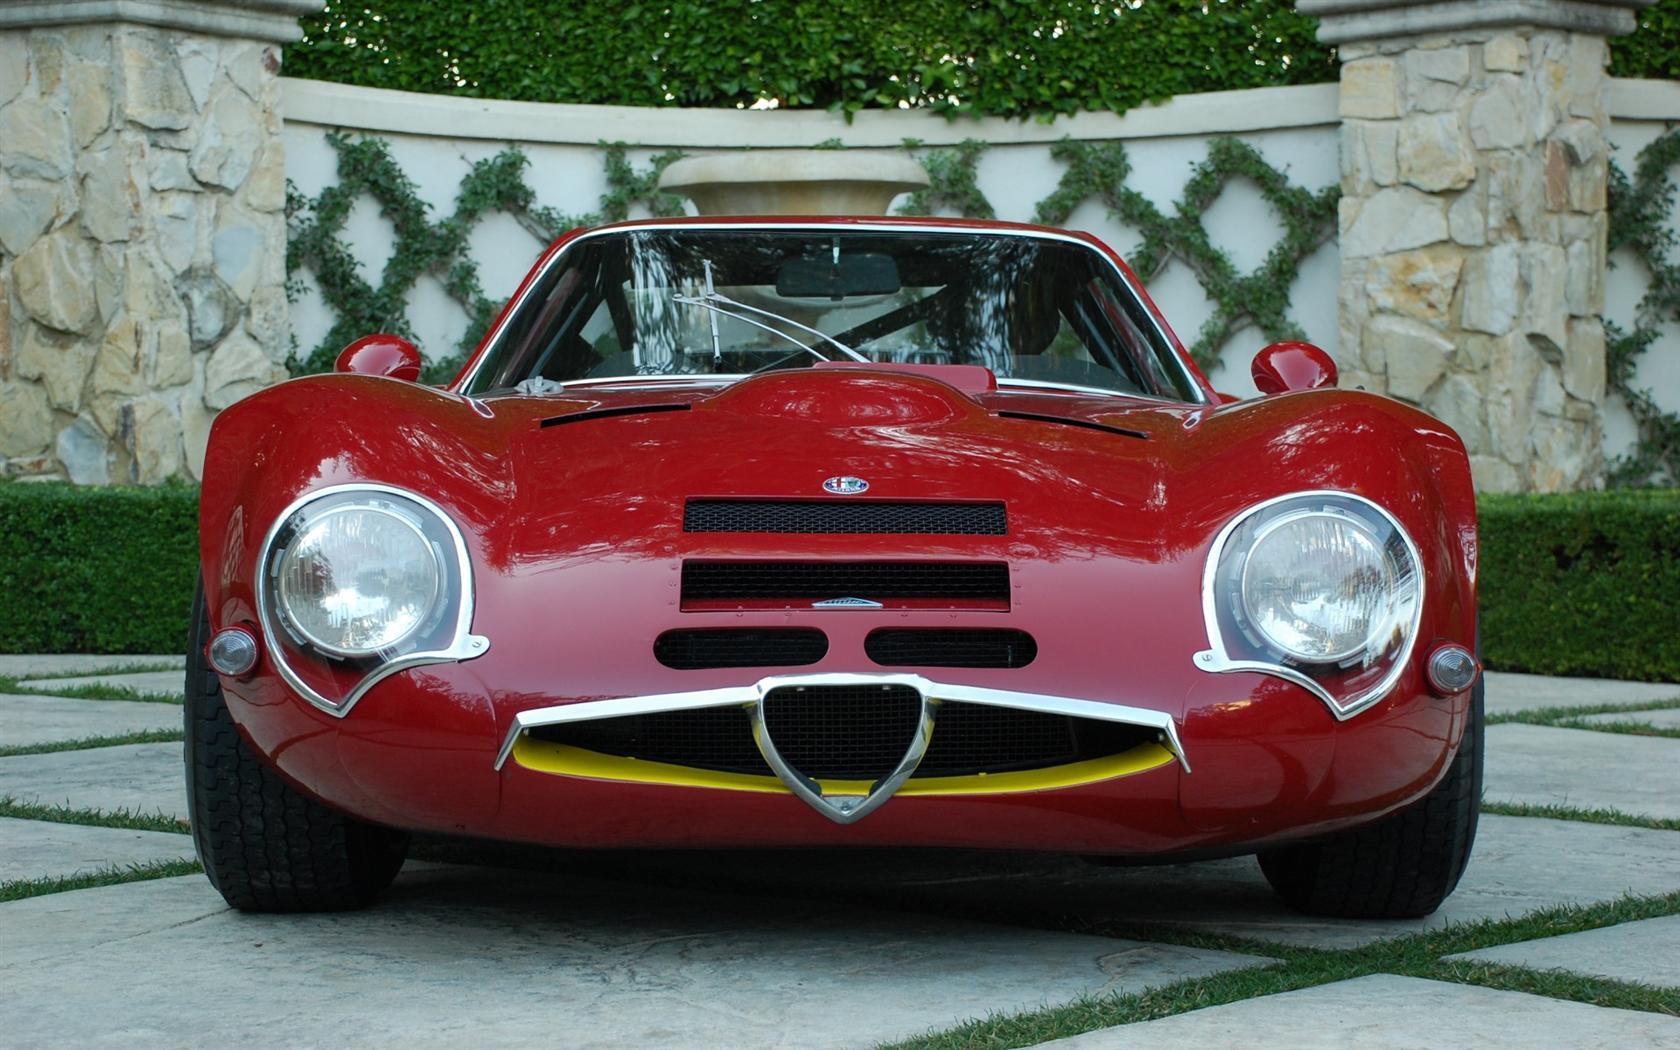 1965 Alfa Romeo Giulia TZ2 Images Photo 1965AlfaRomeoTZ2